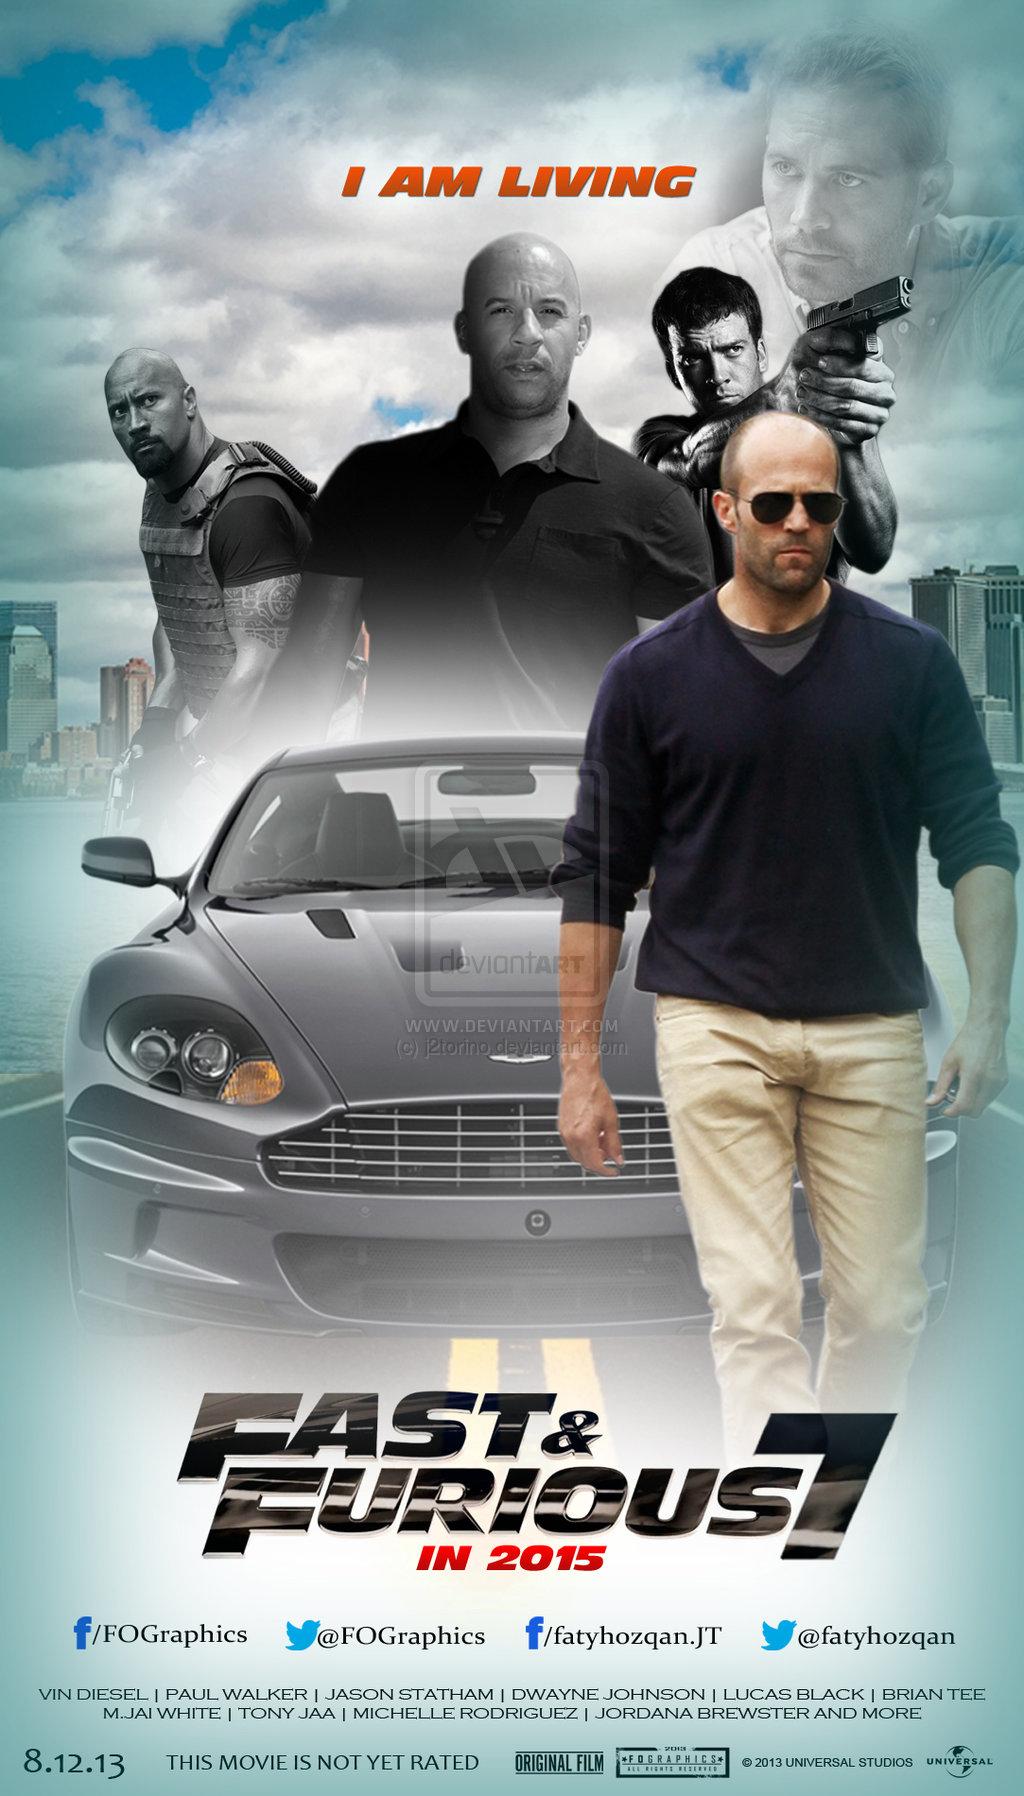 Nonton Film Fast And Furious 8 : nonton, furious, EXCLUSIVE!, Furious, (English), Download, Peatix